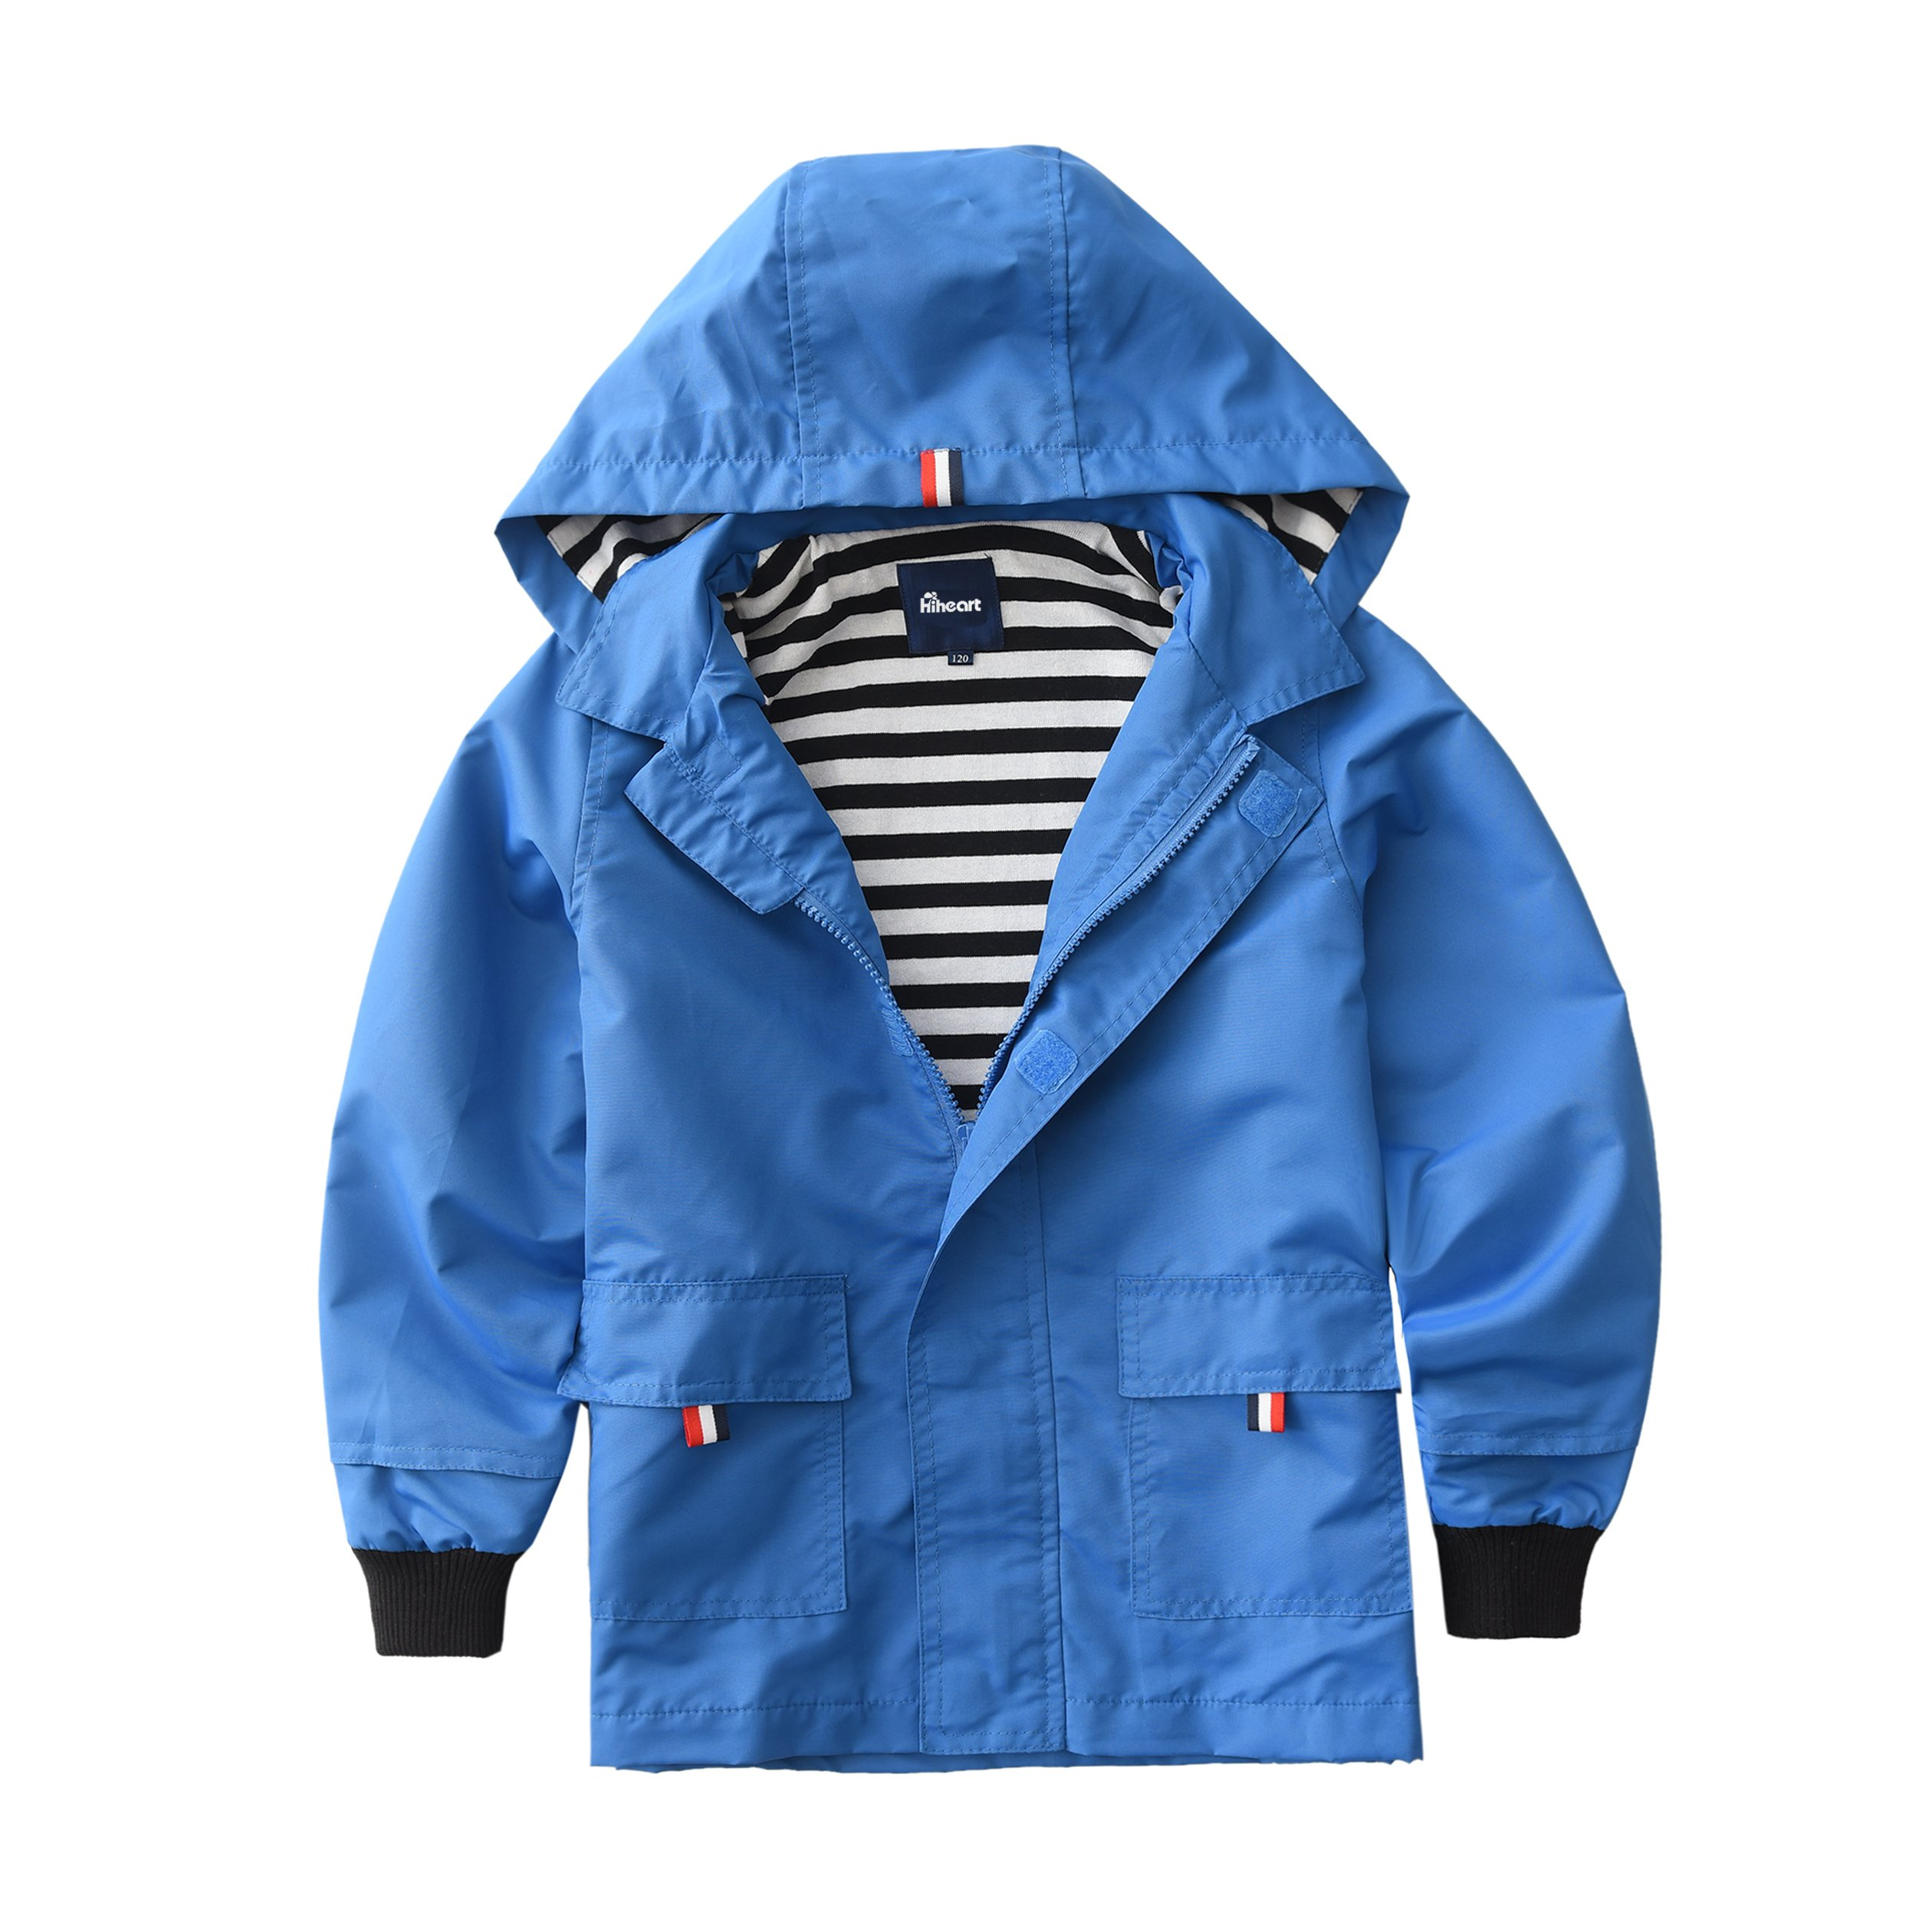 Hiheart Boys Waterproof Hooded Jackets Cotton Lined Rain Jackets Blue 4/5